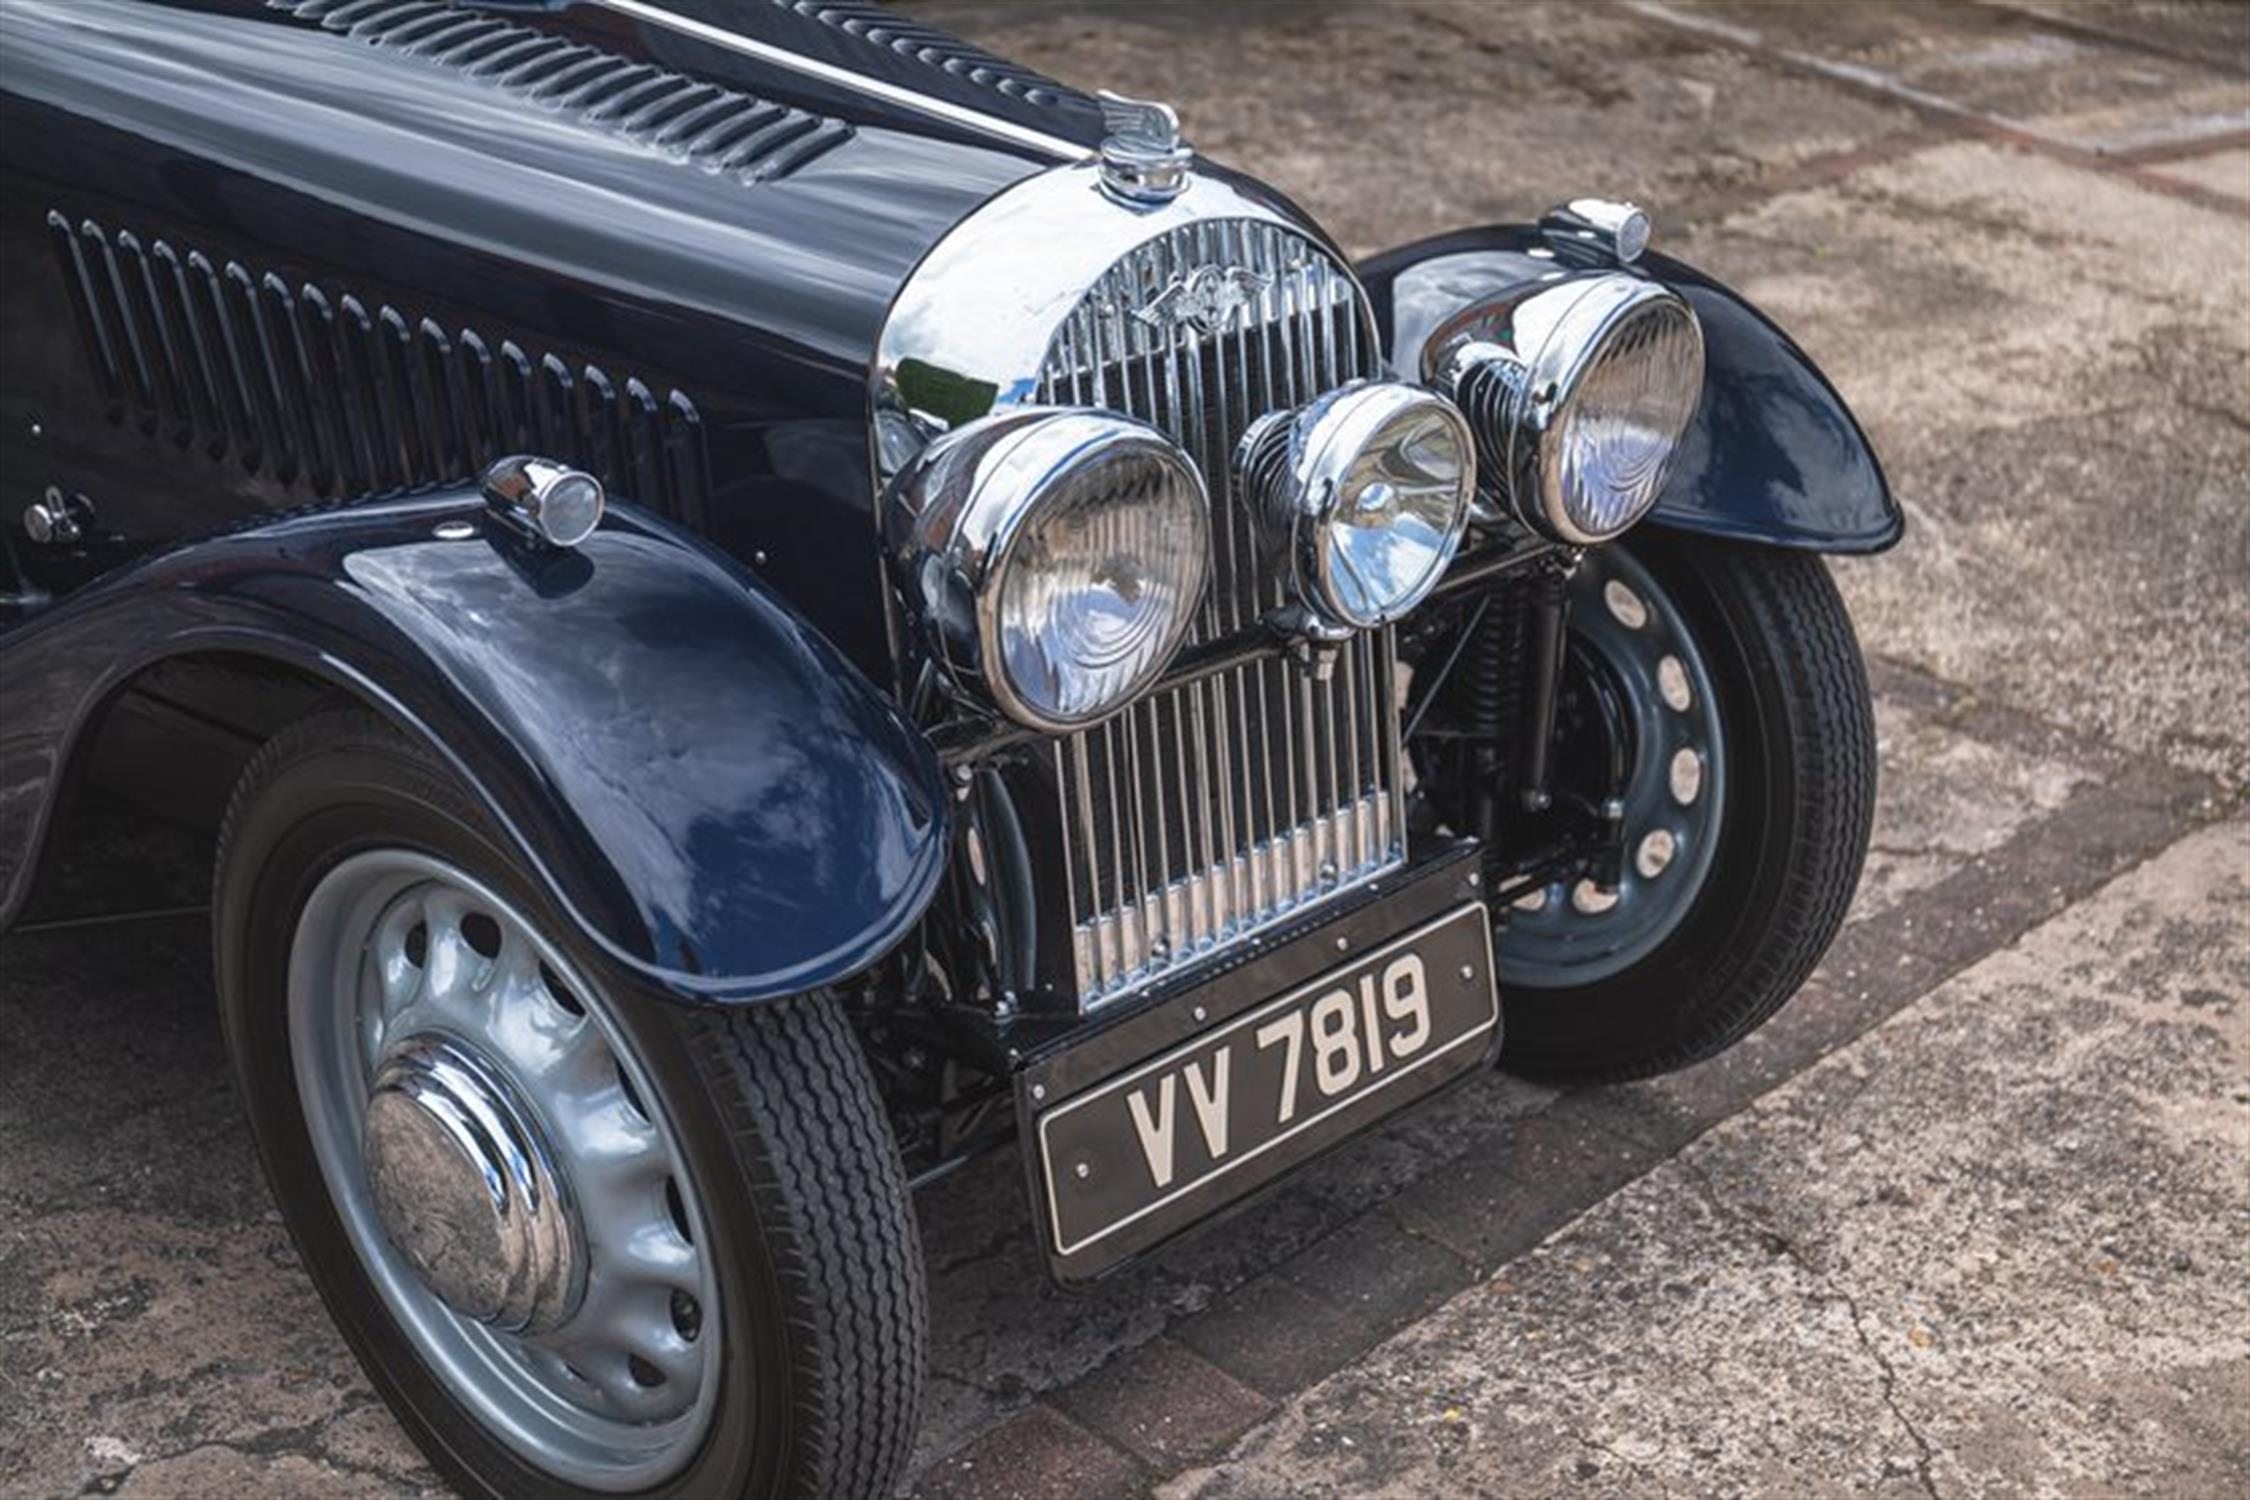 1939 Morgan 4/4 Series 1 'Flat Rad' (1098cc Climax Engine) - Image 10 of 10